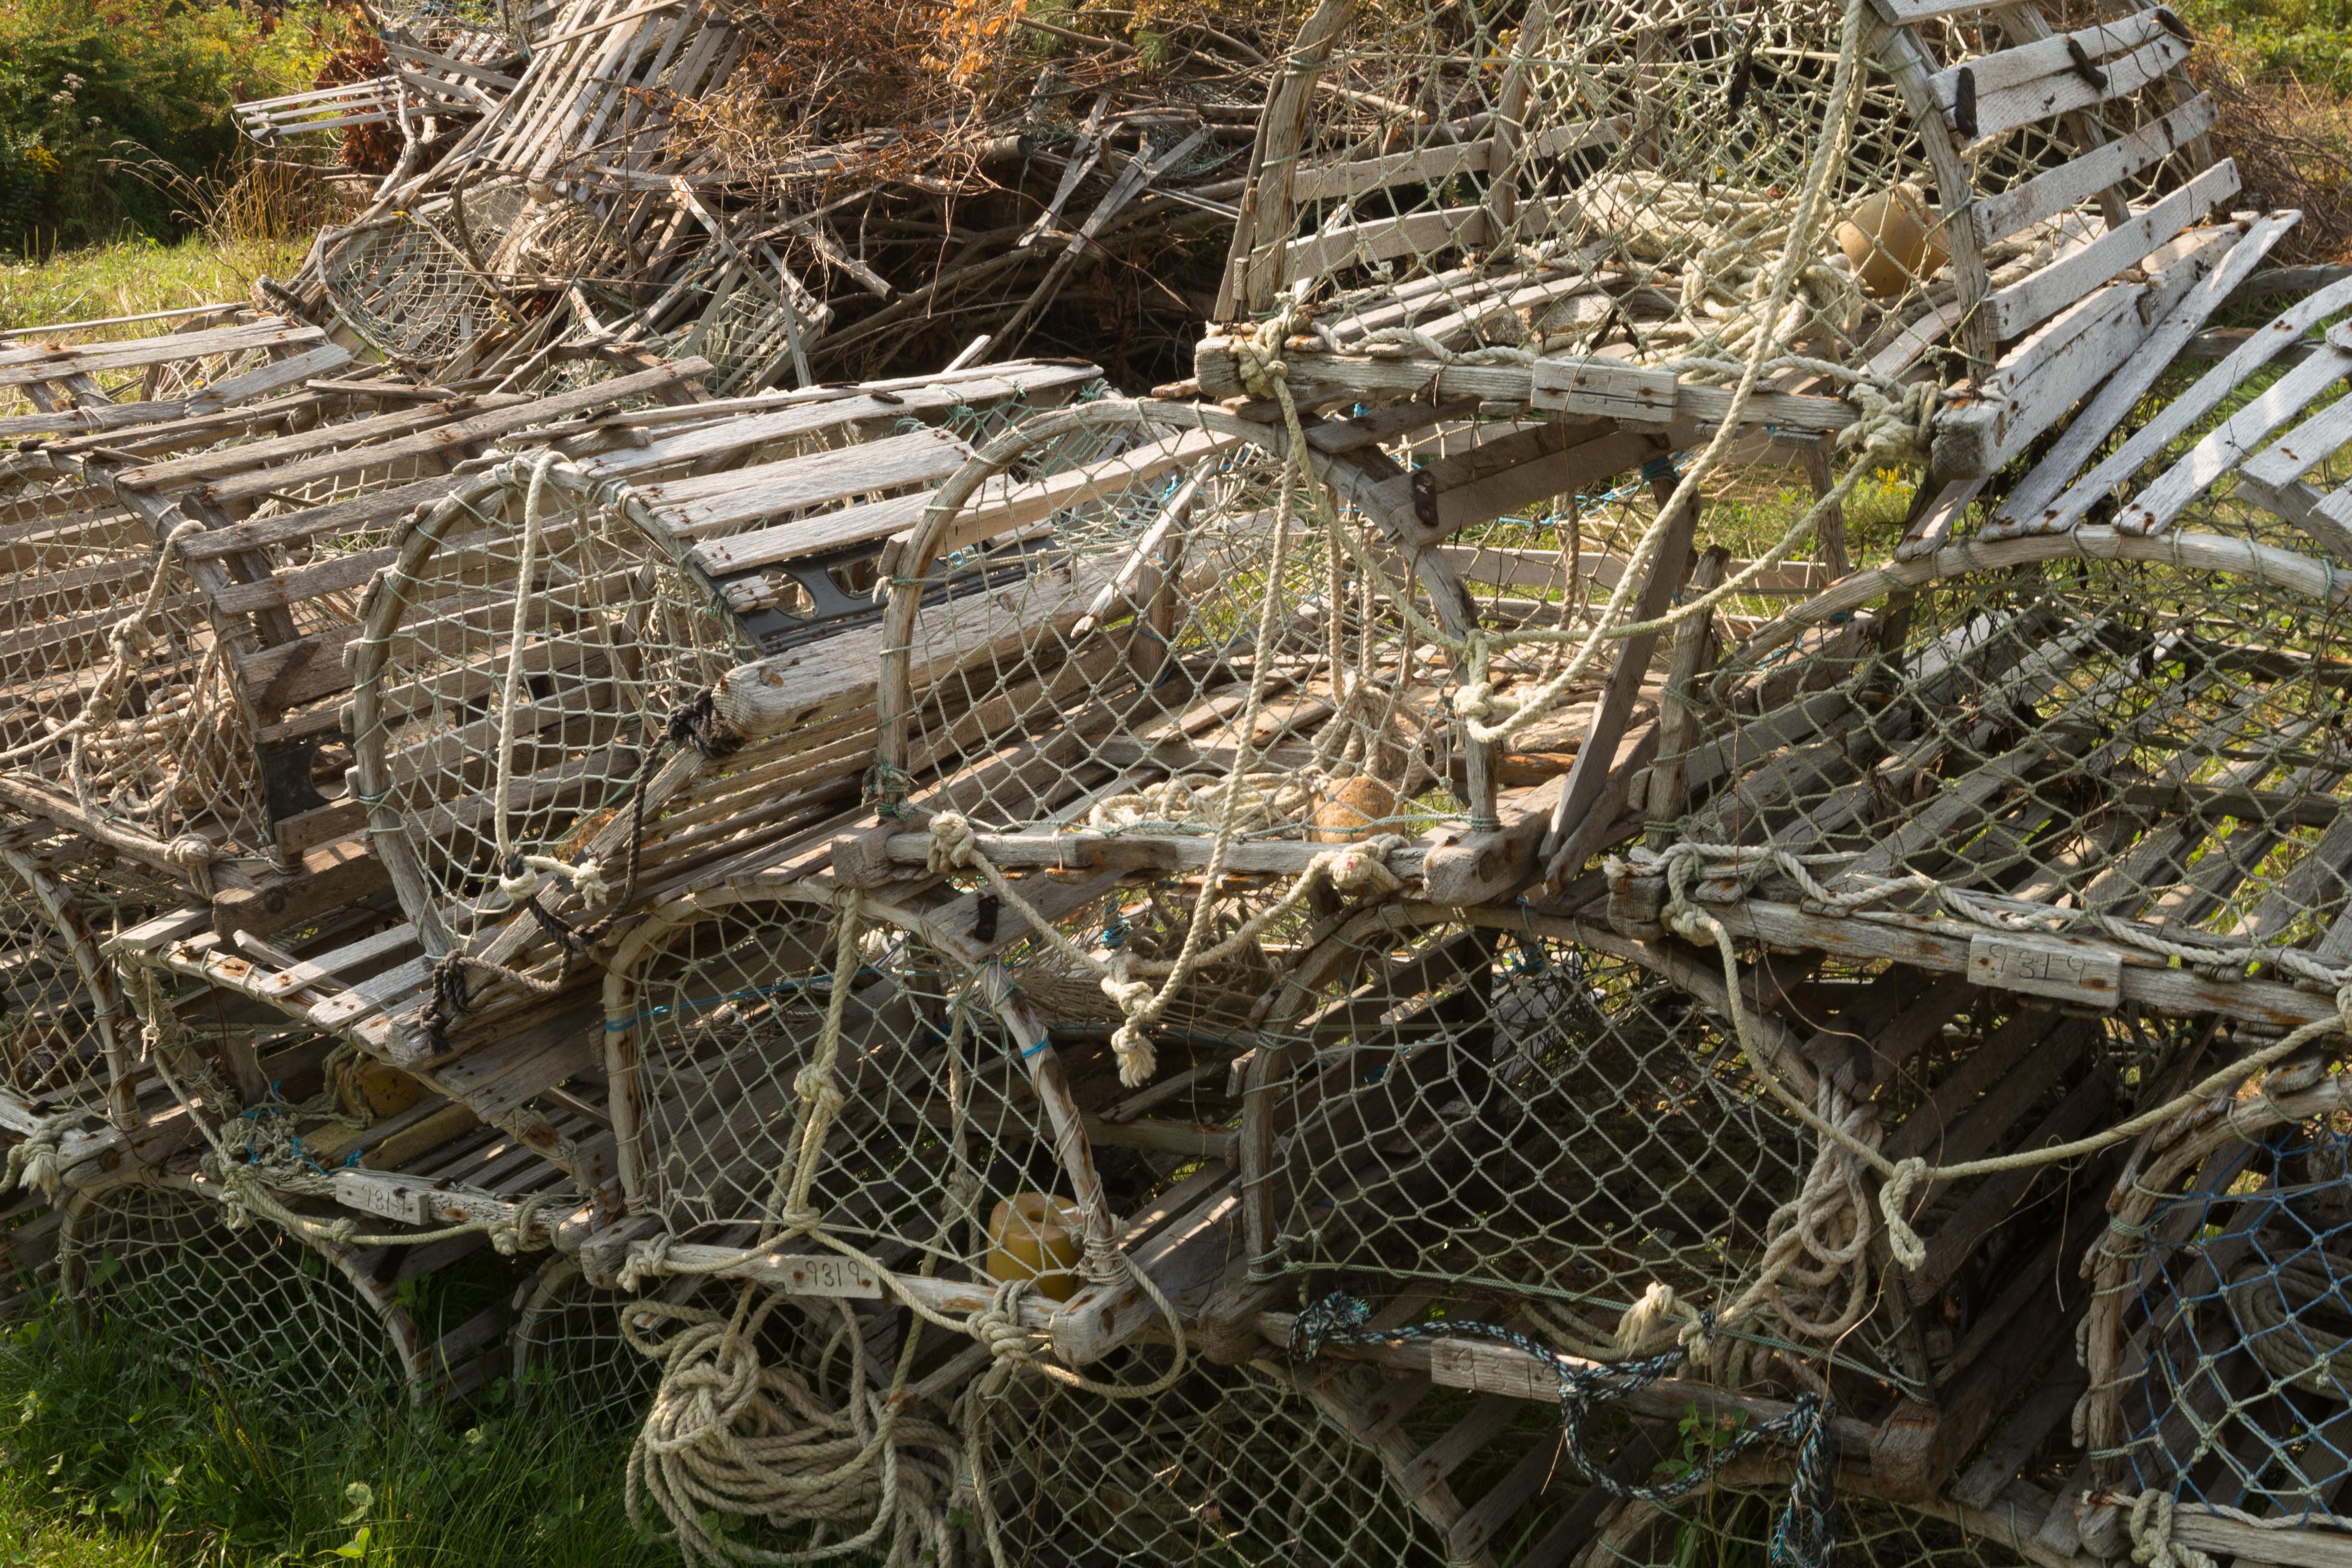 Old Lobster Traps